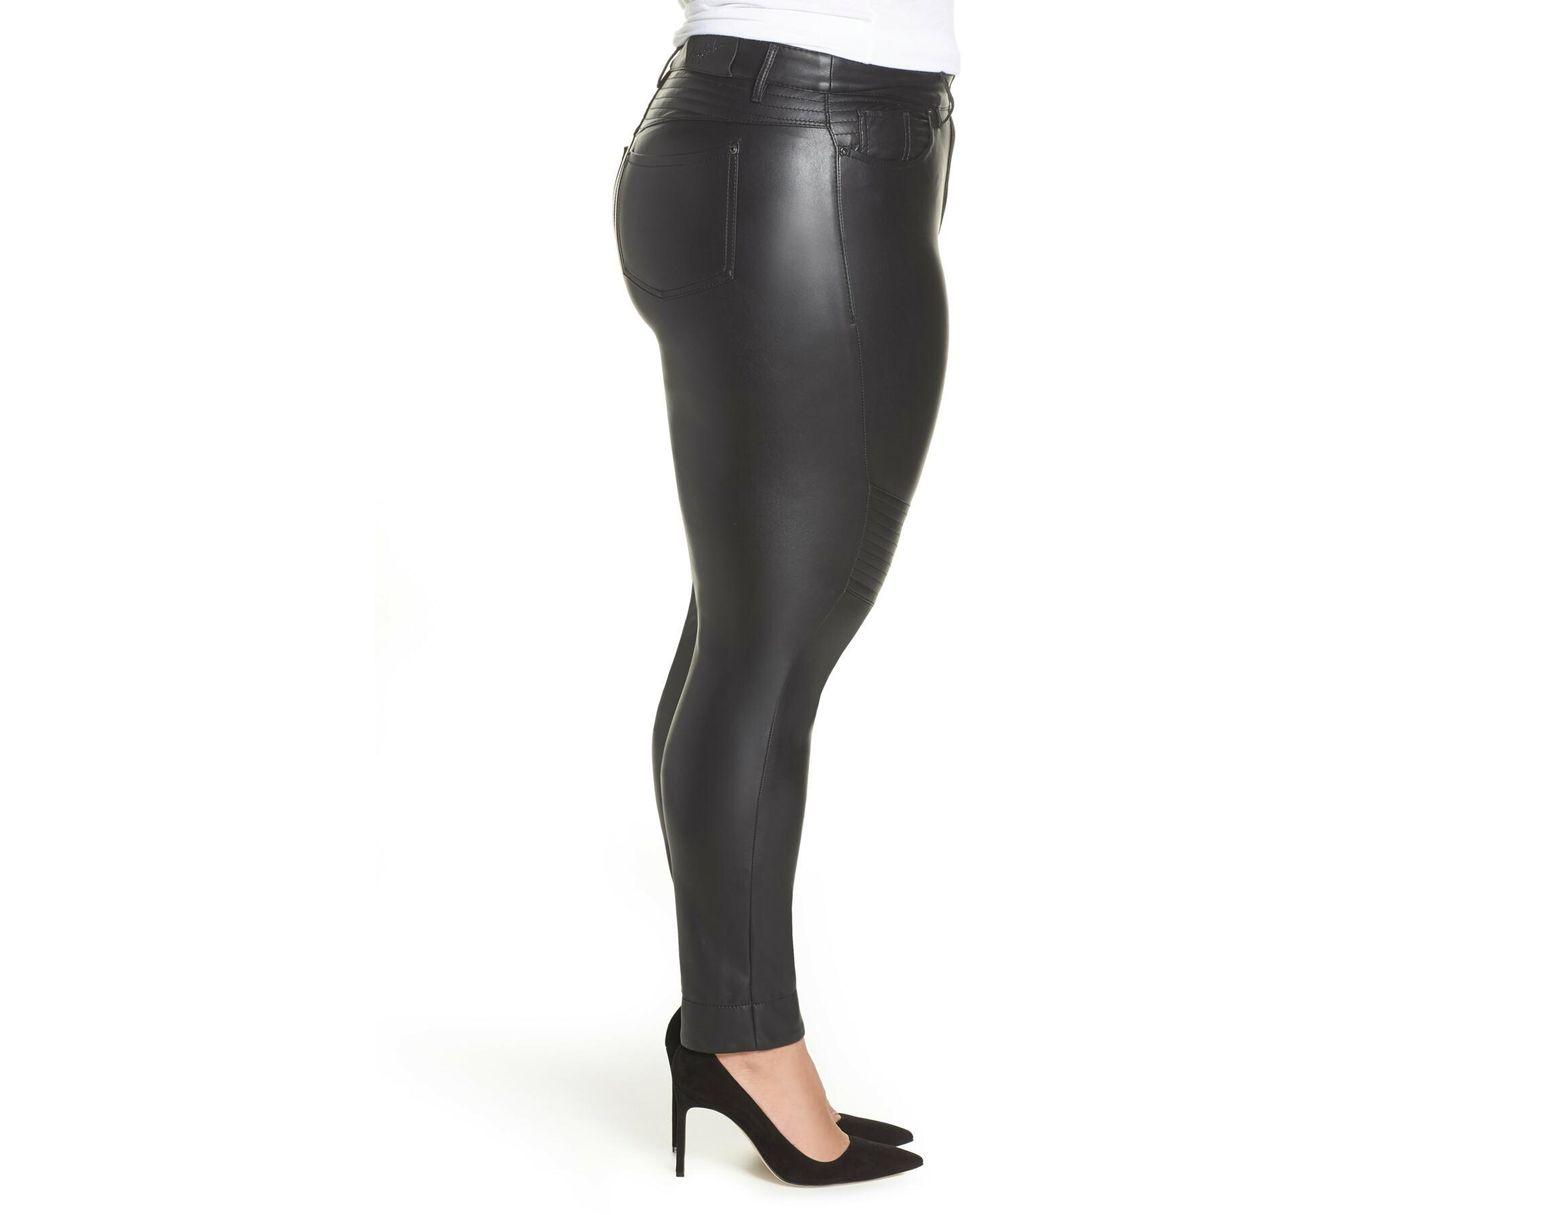 Marina Rinaldi Richi Faux Leather Pants (plus Size) in Black